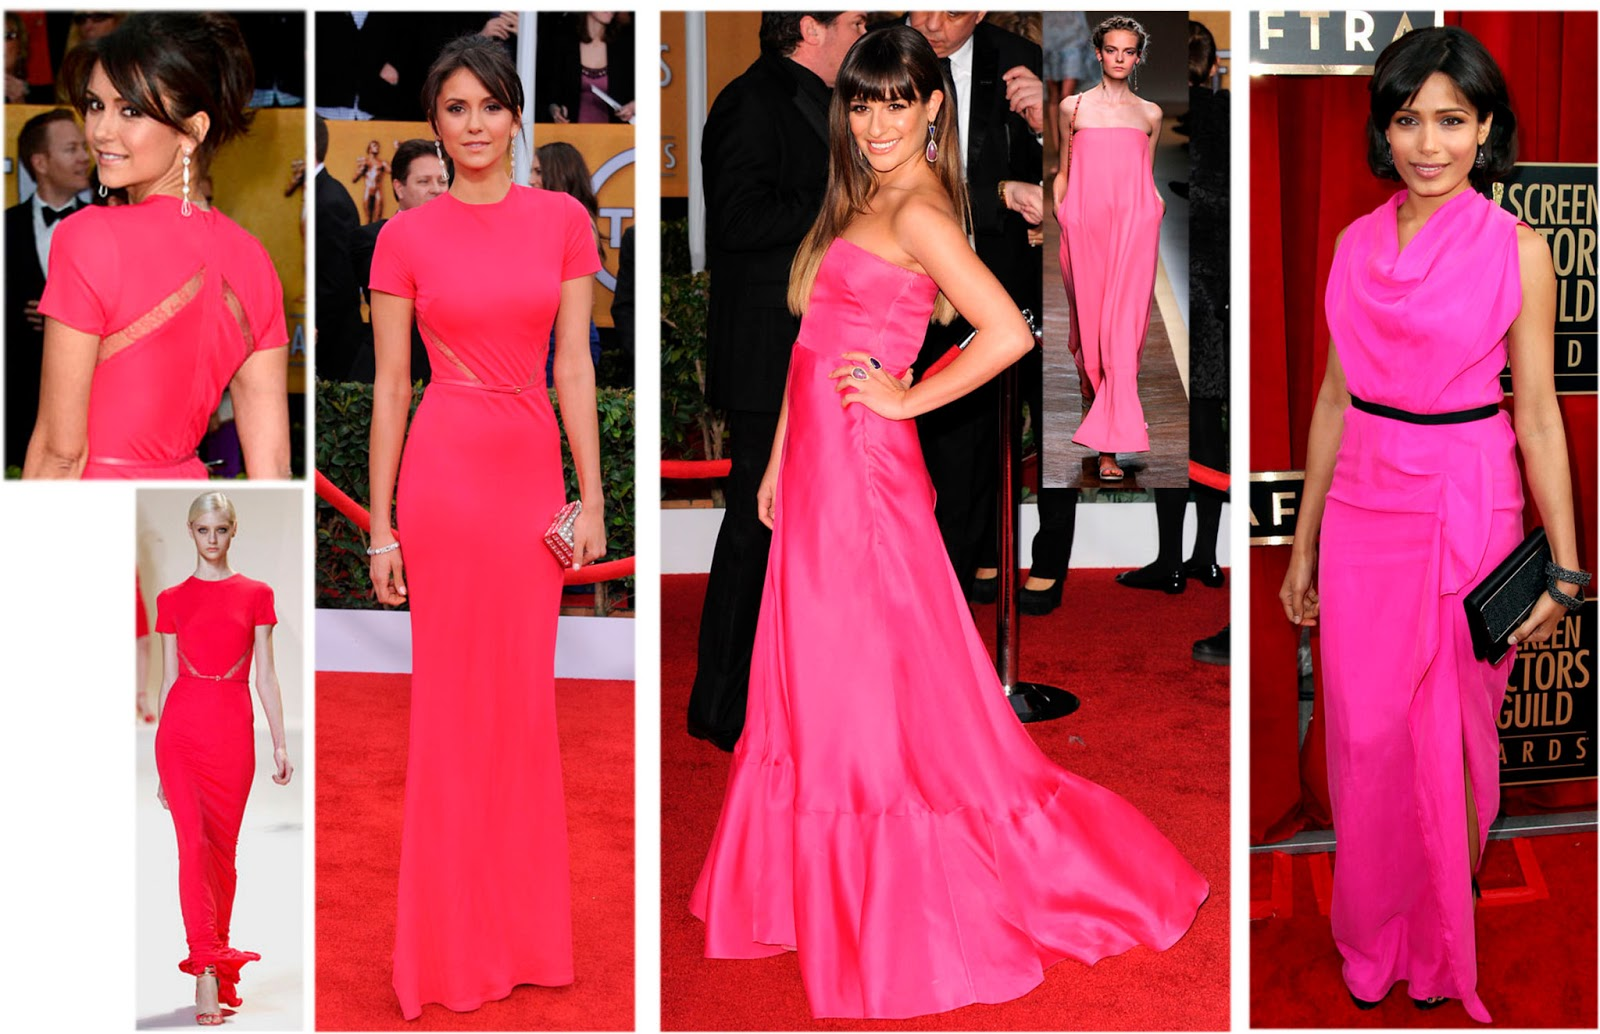 http://2.bp.blogspot.com/-i5DBCauH1aI/UQZx0qBKP1I/AAAAAAAAF0A/pwDLmG8MVy8/s1600/actrices+premios+sindicato+actores.jpg